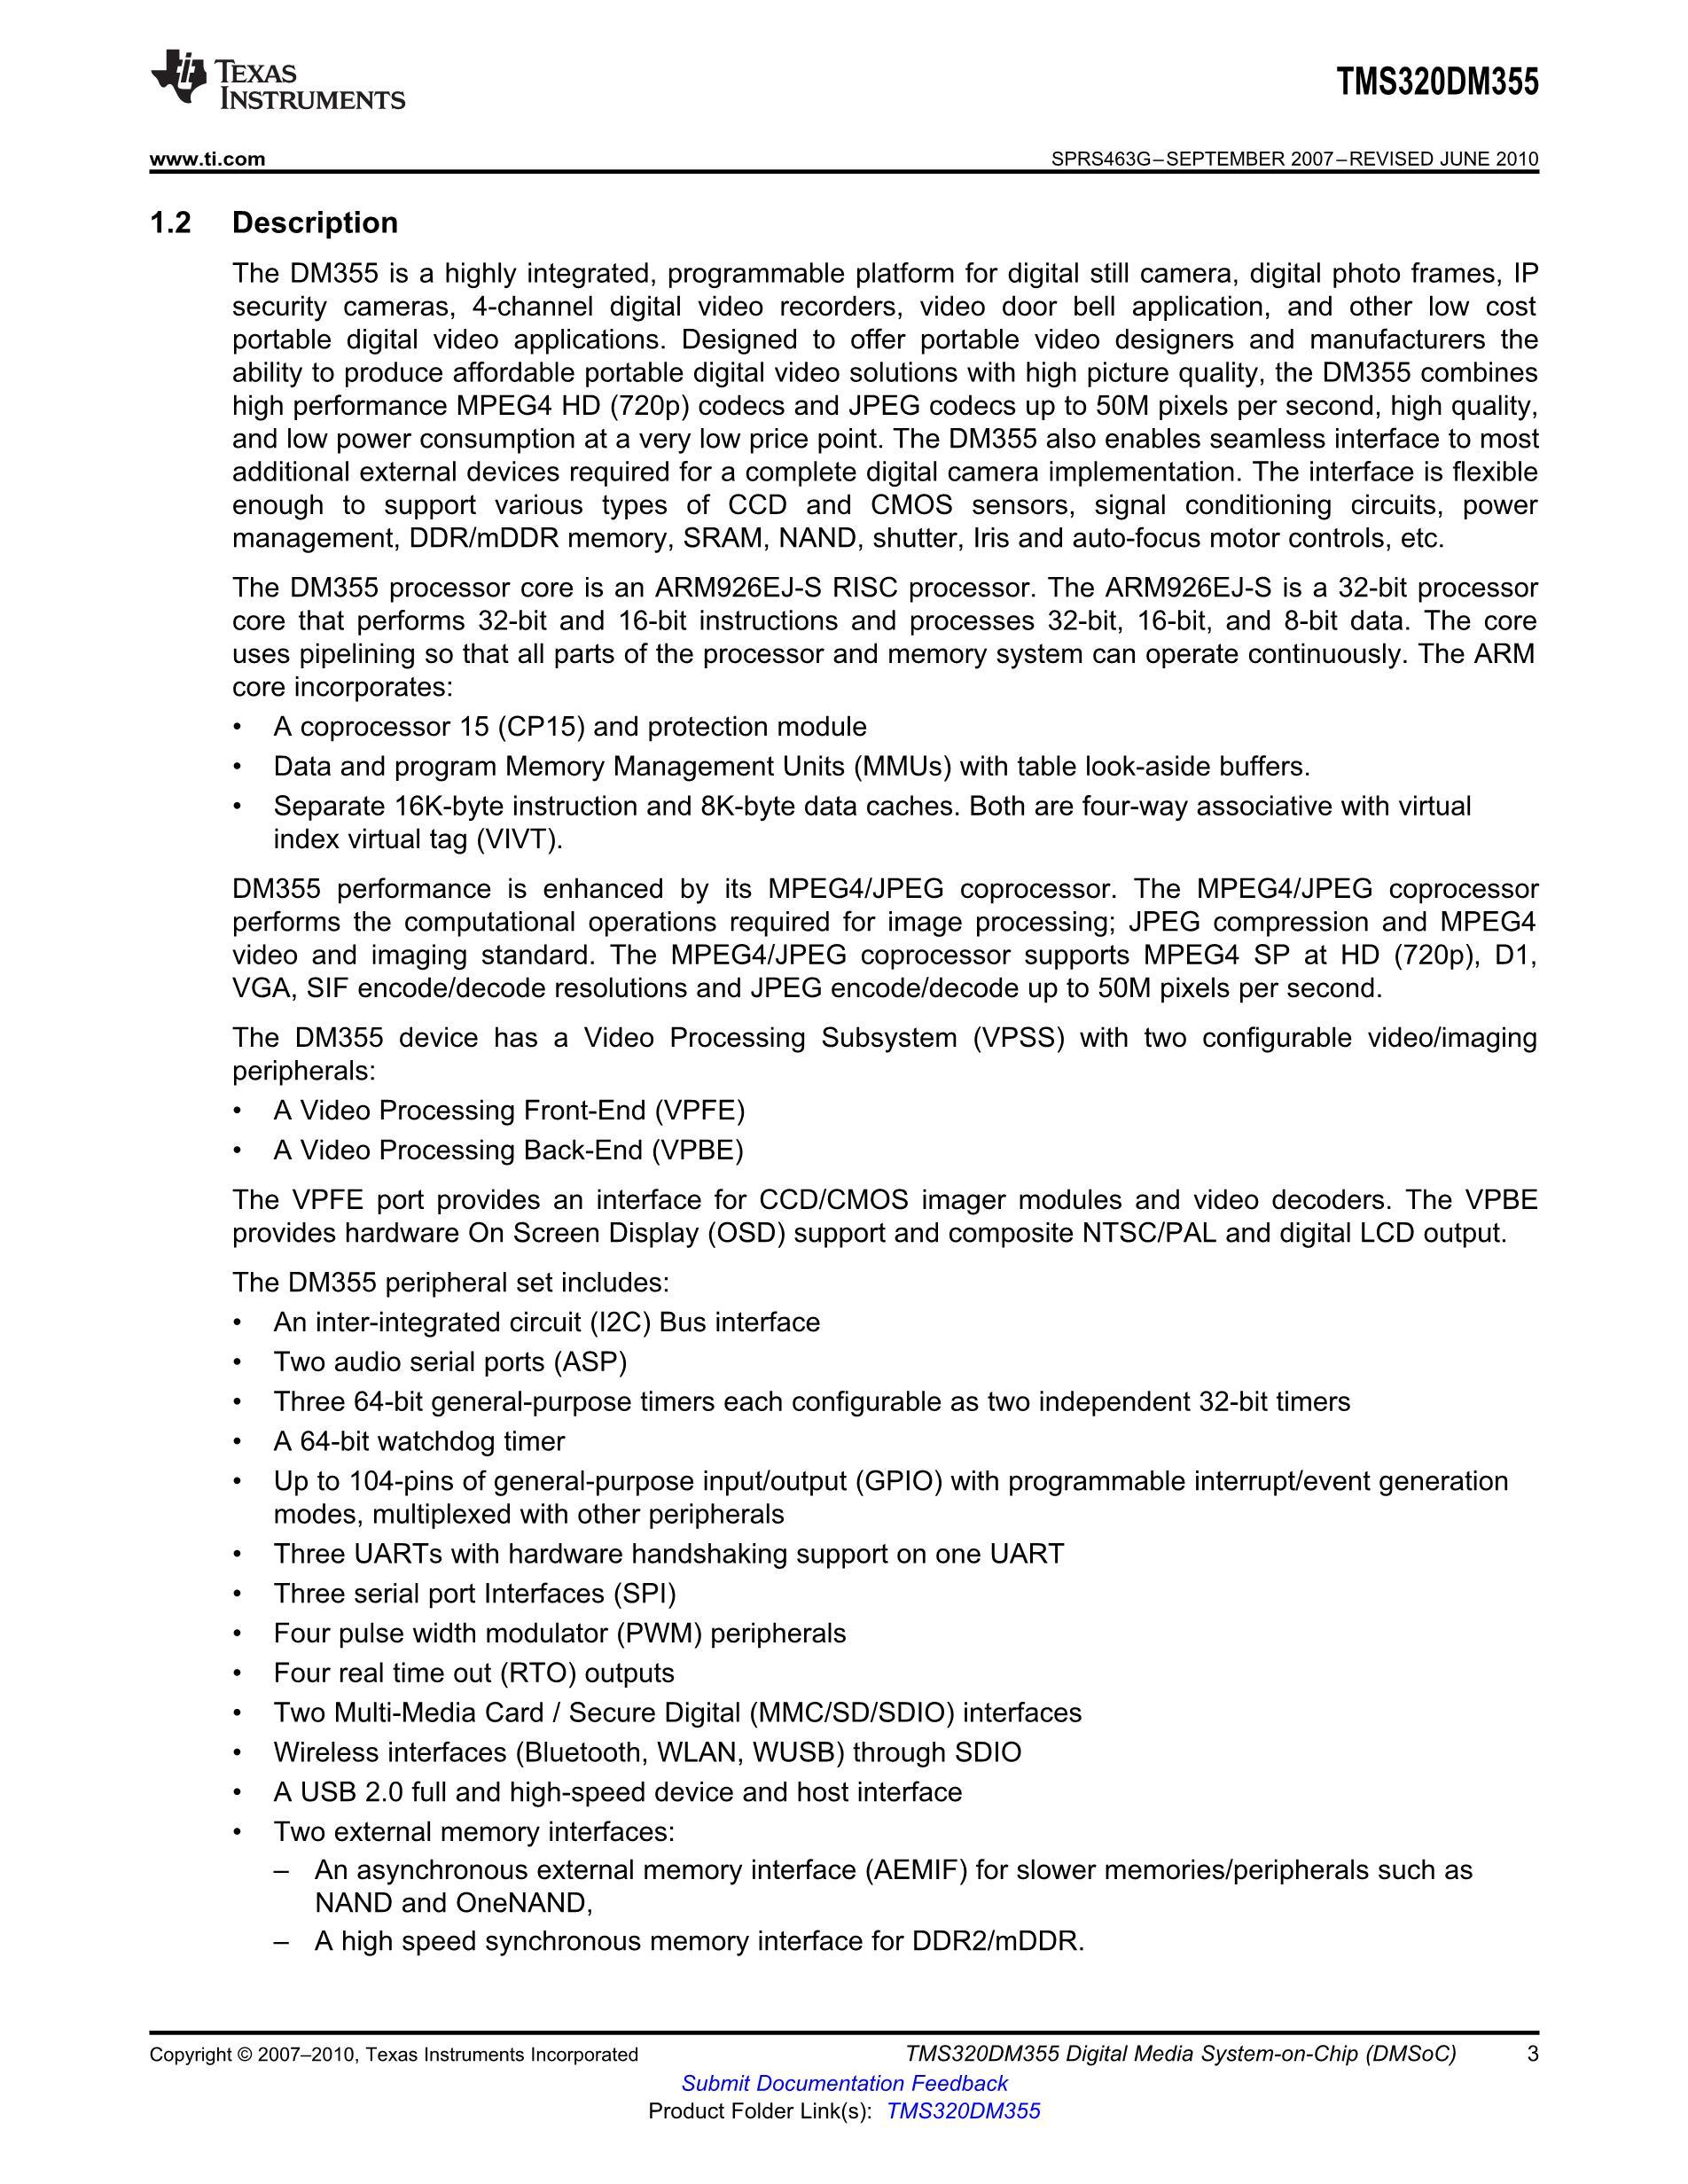 DM355SDZCE135's pdf picture 3